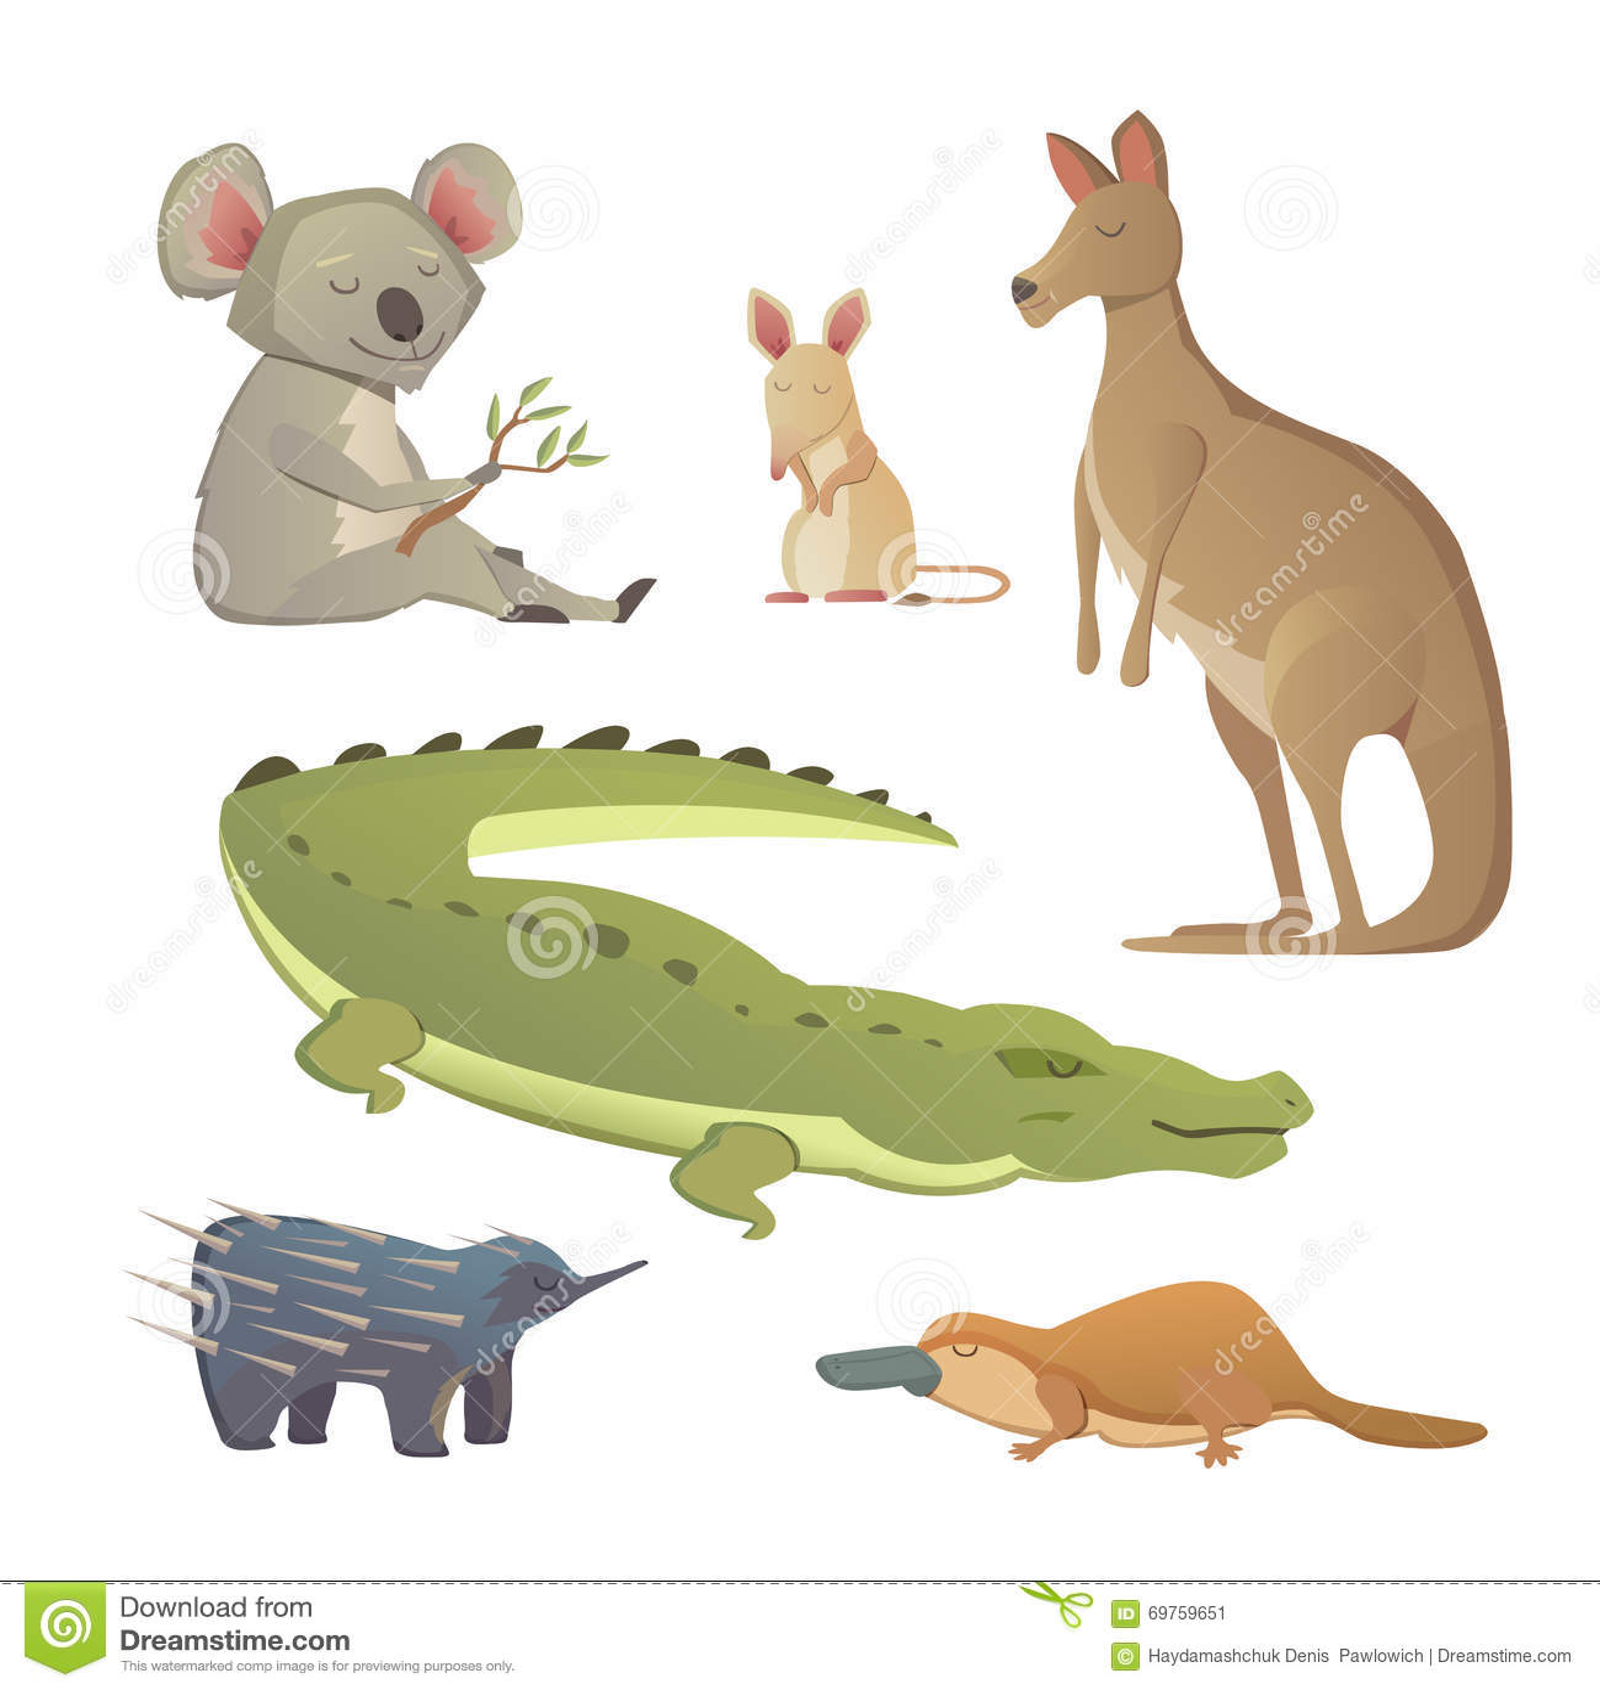 how to set up abn australia